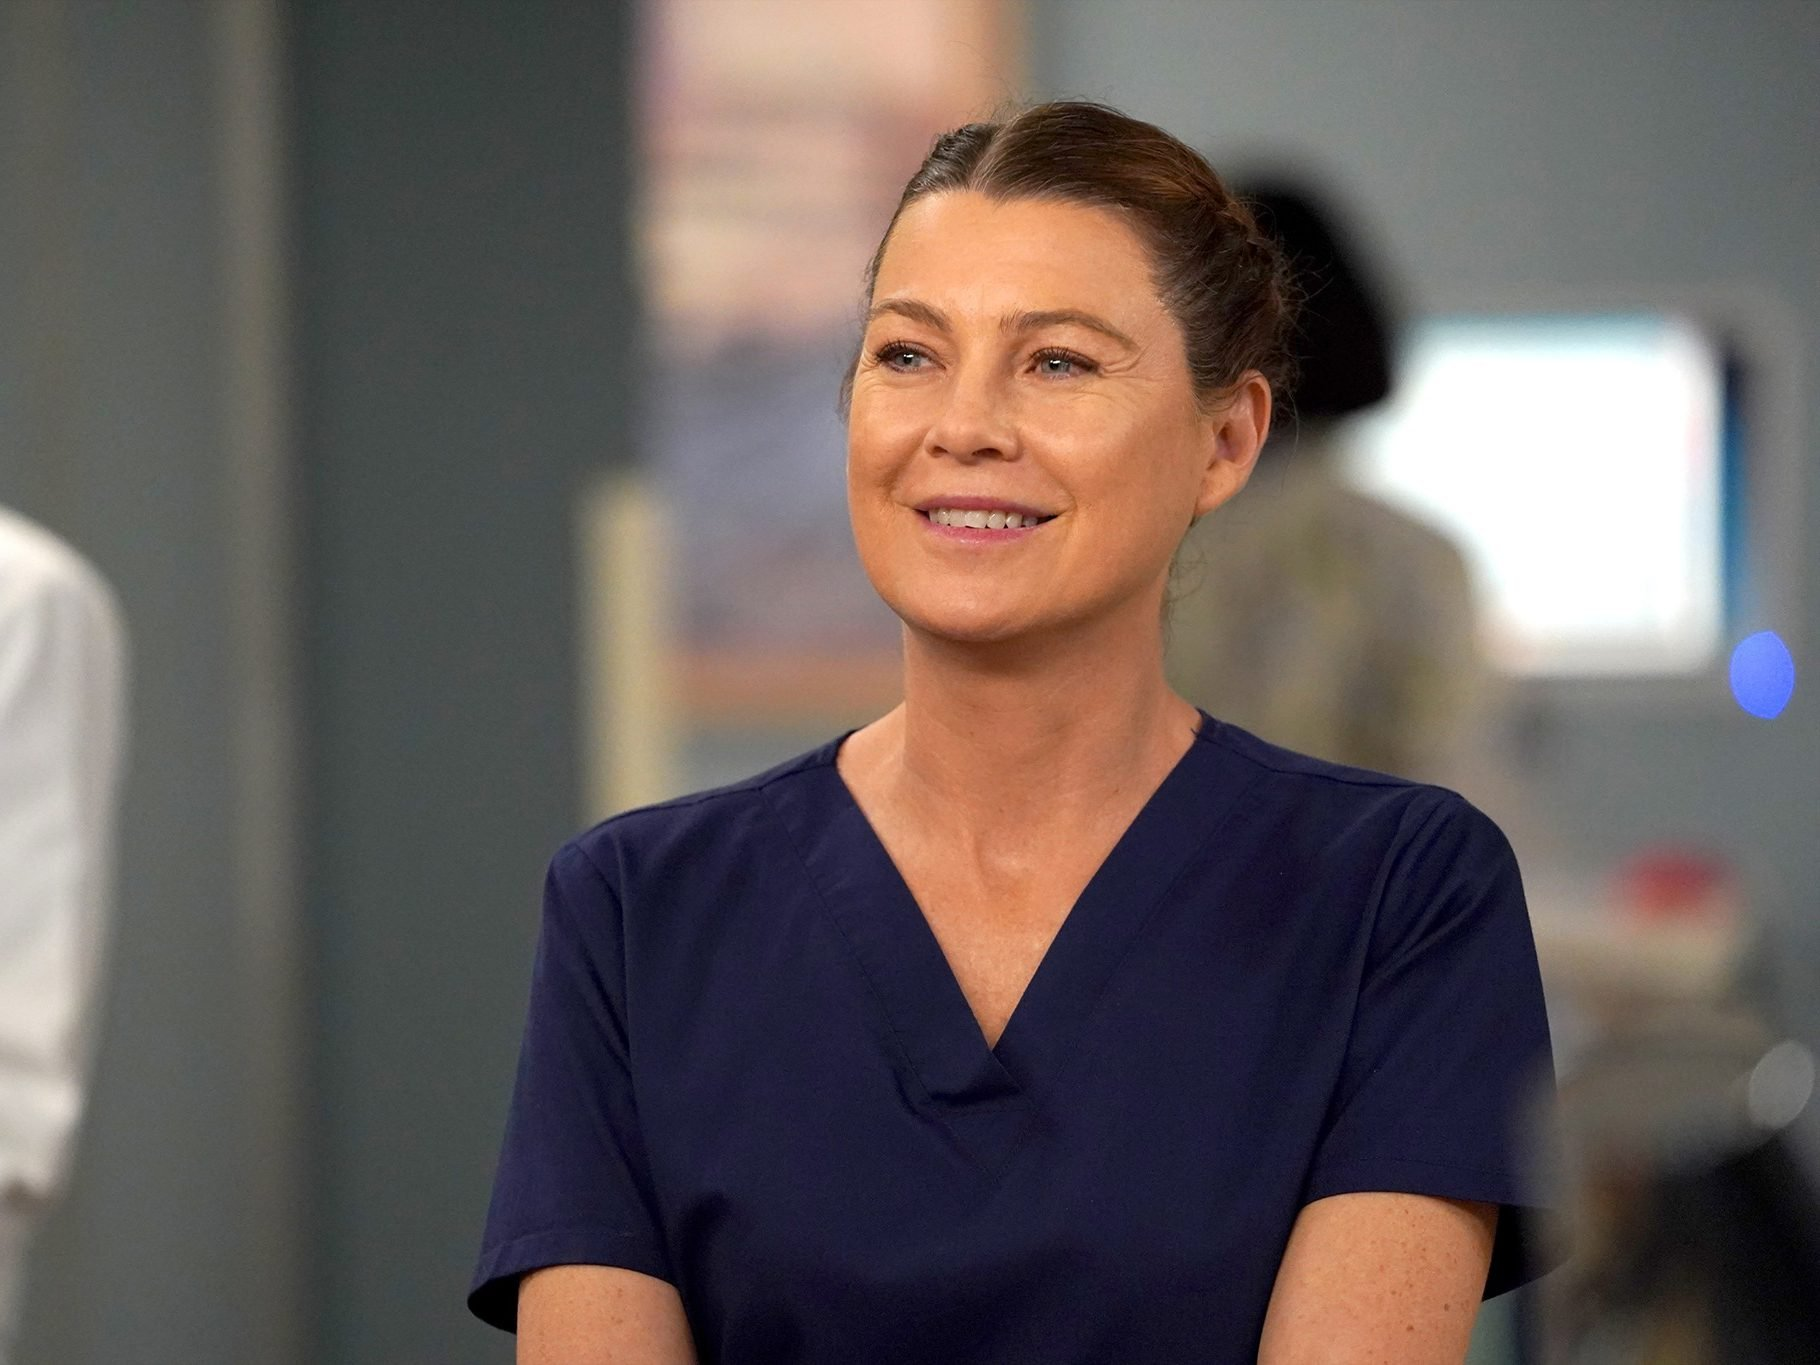 Grey's Anatomy Quotes - Meredith Grey